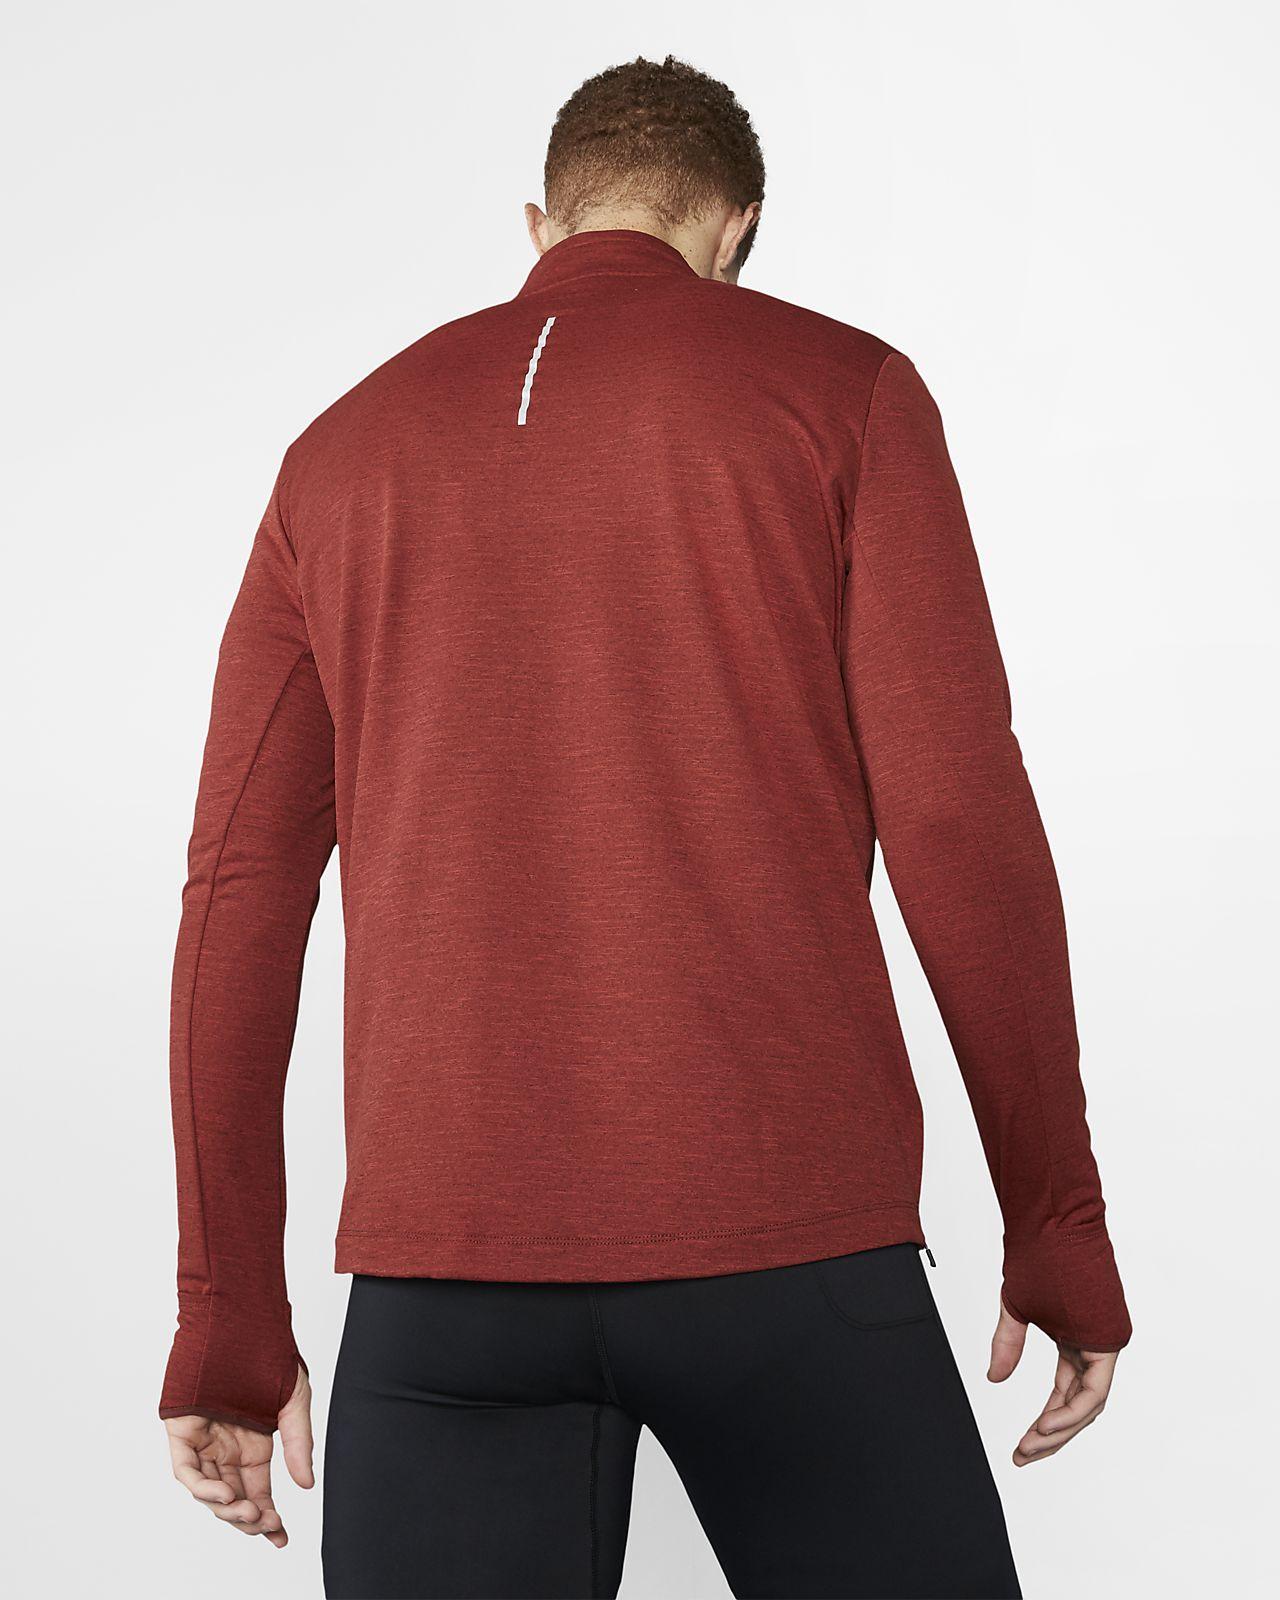 cb09f099 Nike Therma-Sphere Men's 1/2-Zip Running Top. Nike.com NO